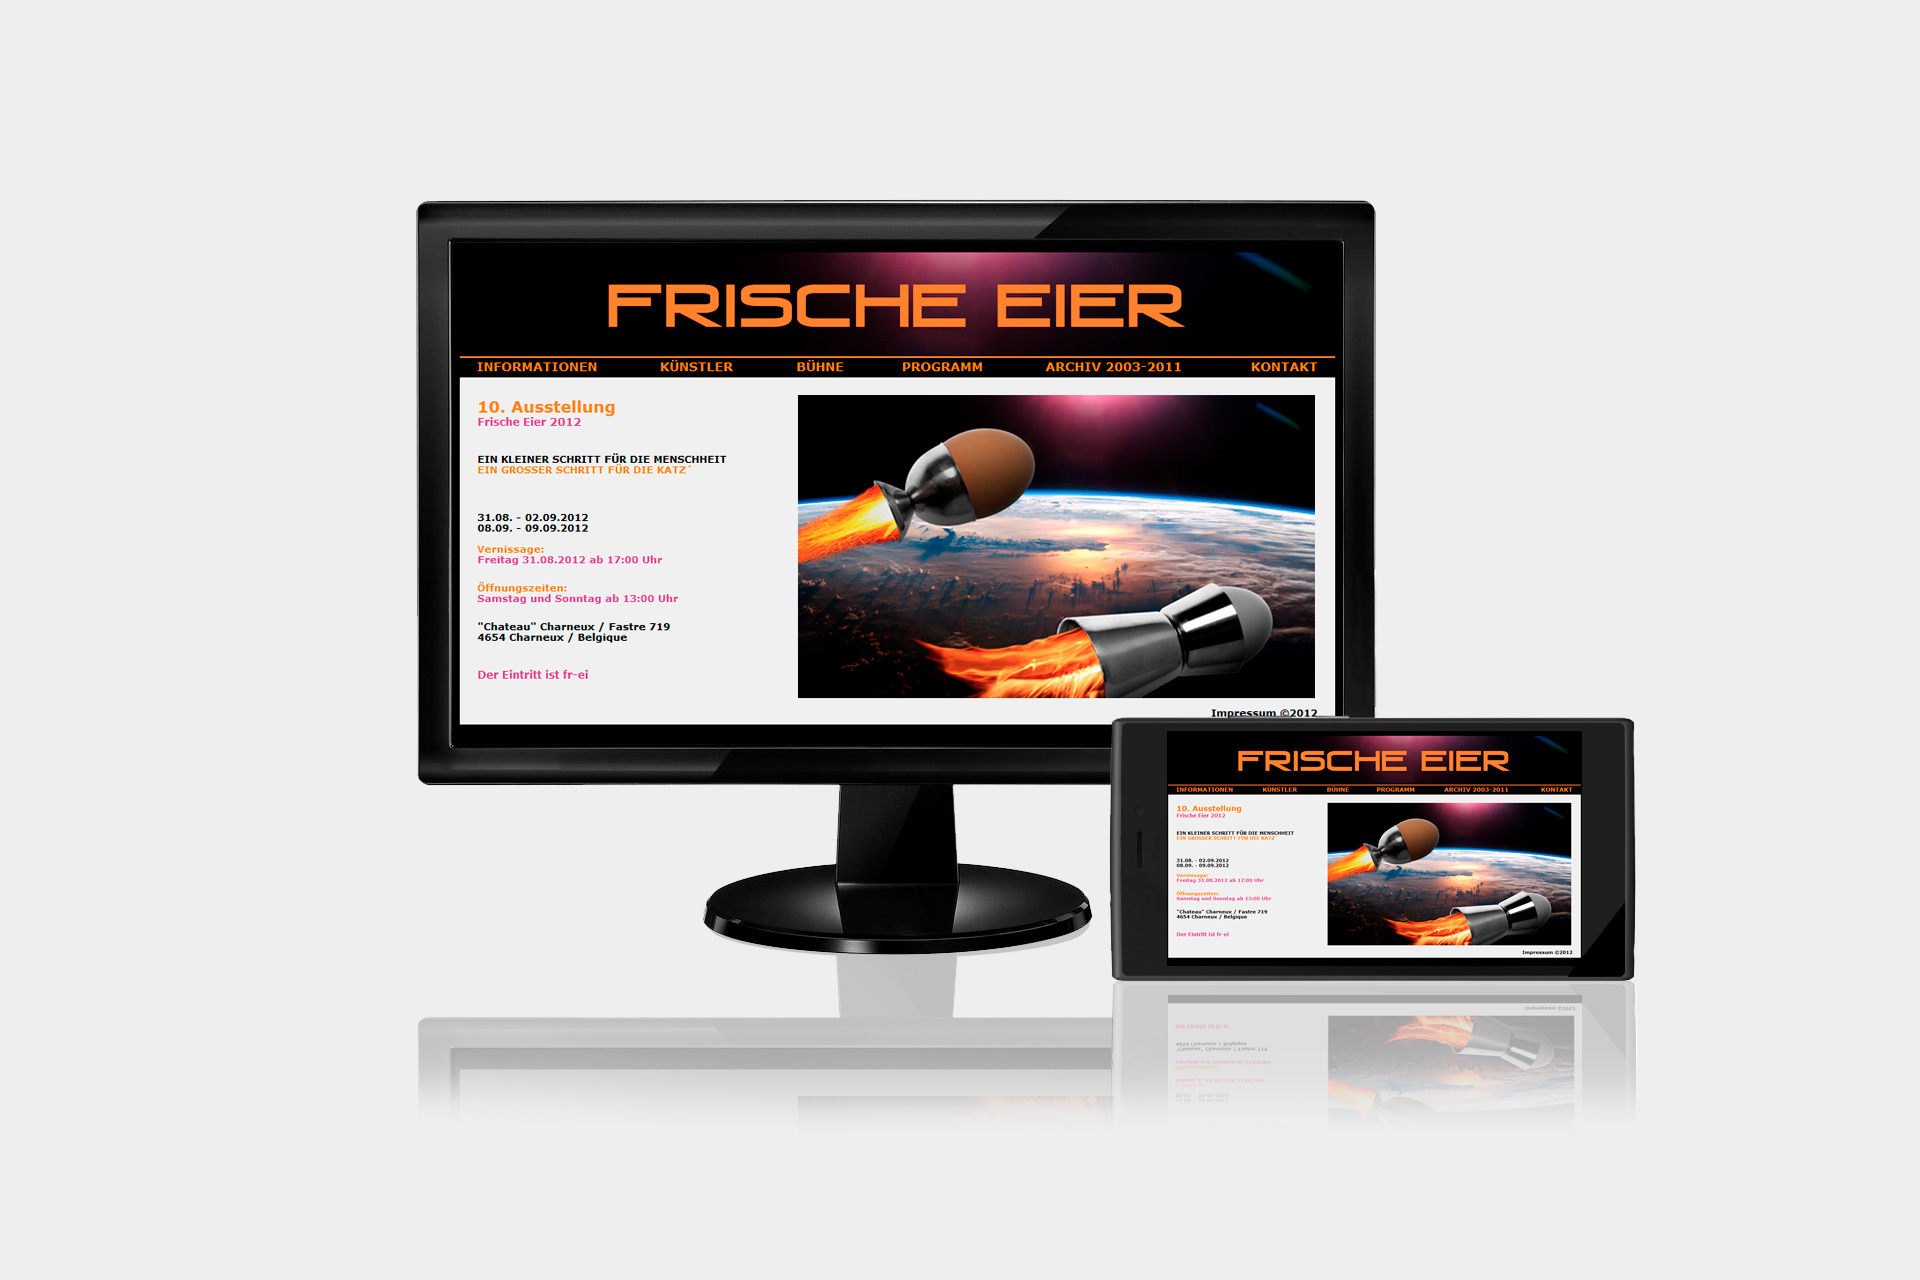 webdesign-frische-eier